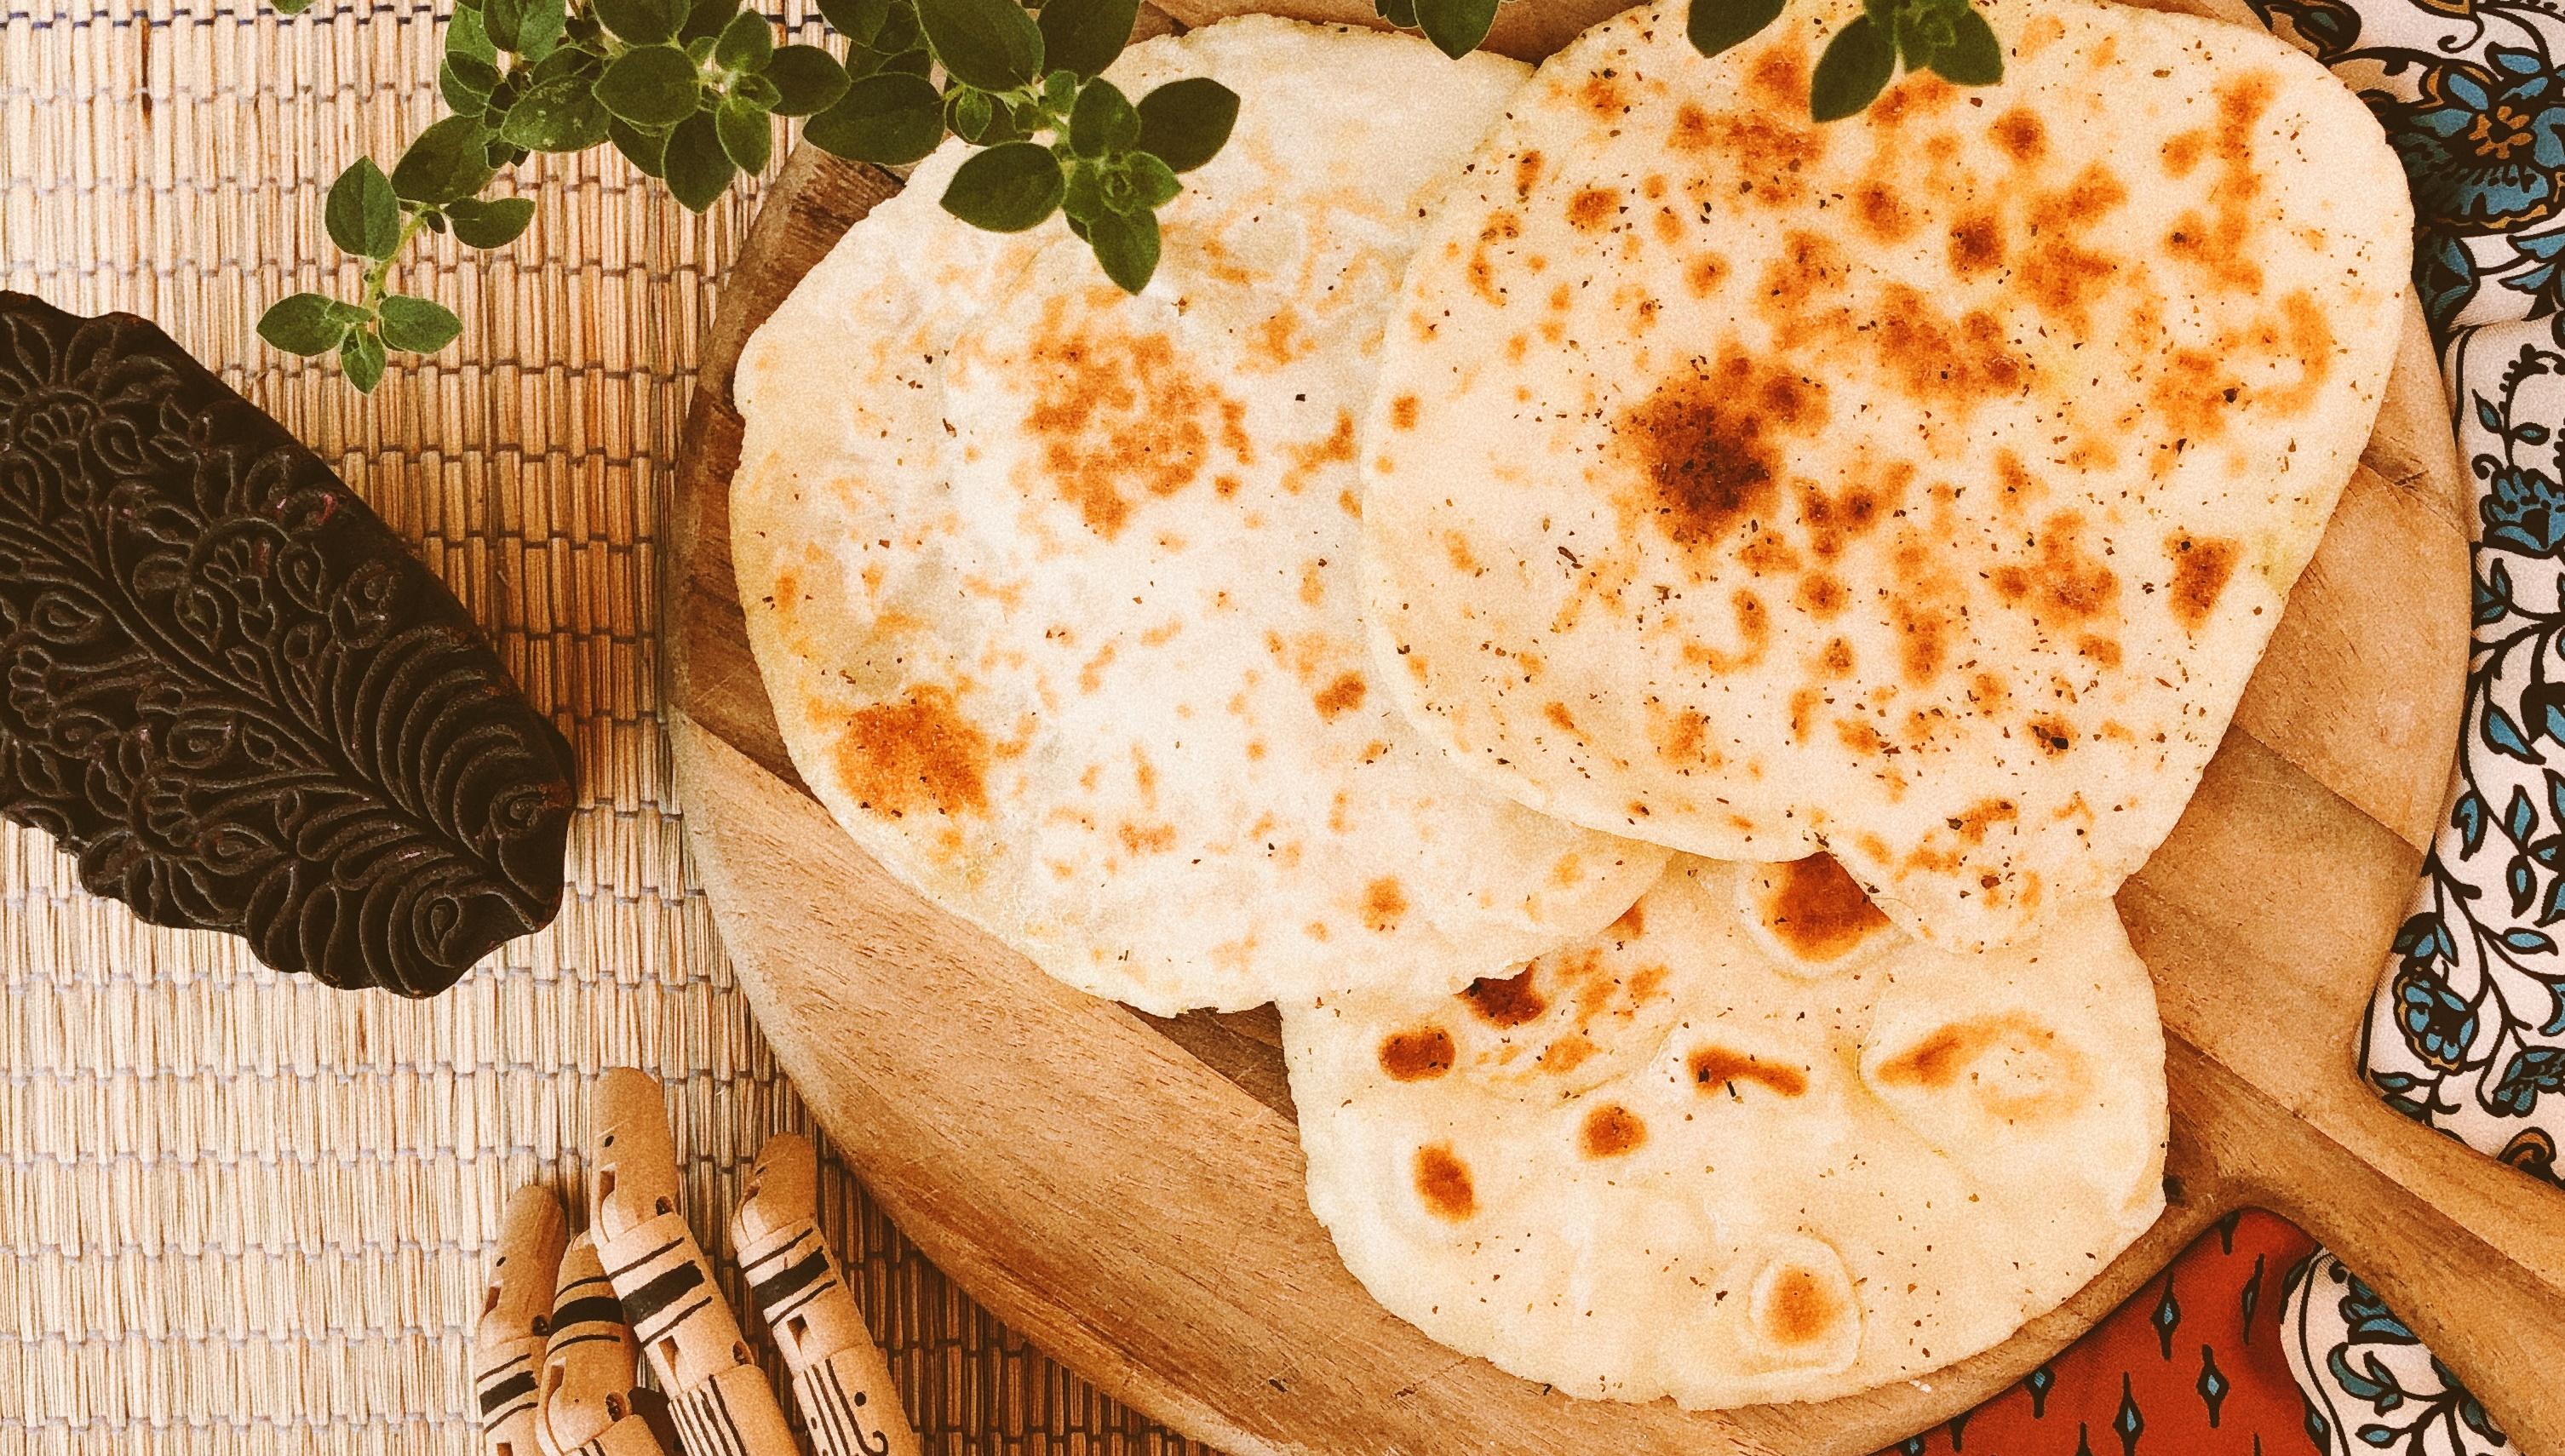 Ricetta Per Naan Pane Indiano.Naan Pane Indiano Ricetta Senza Glutine Schar